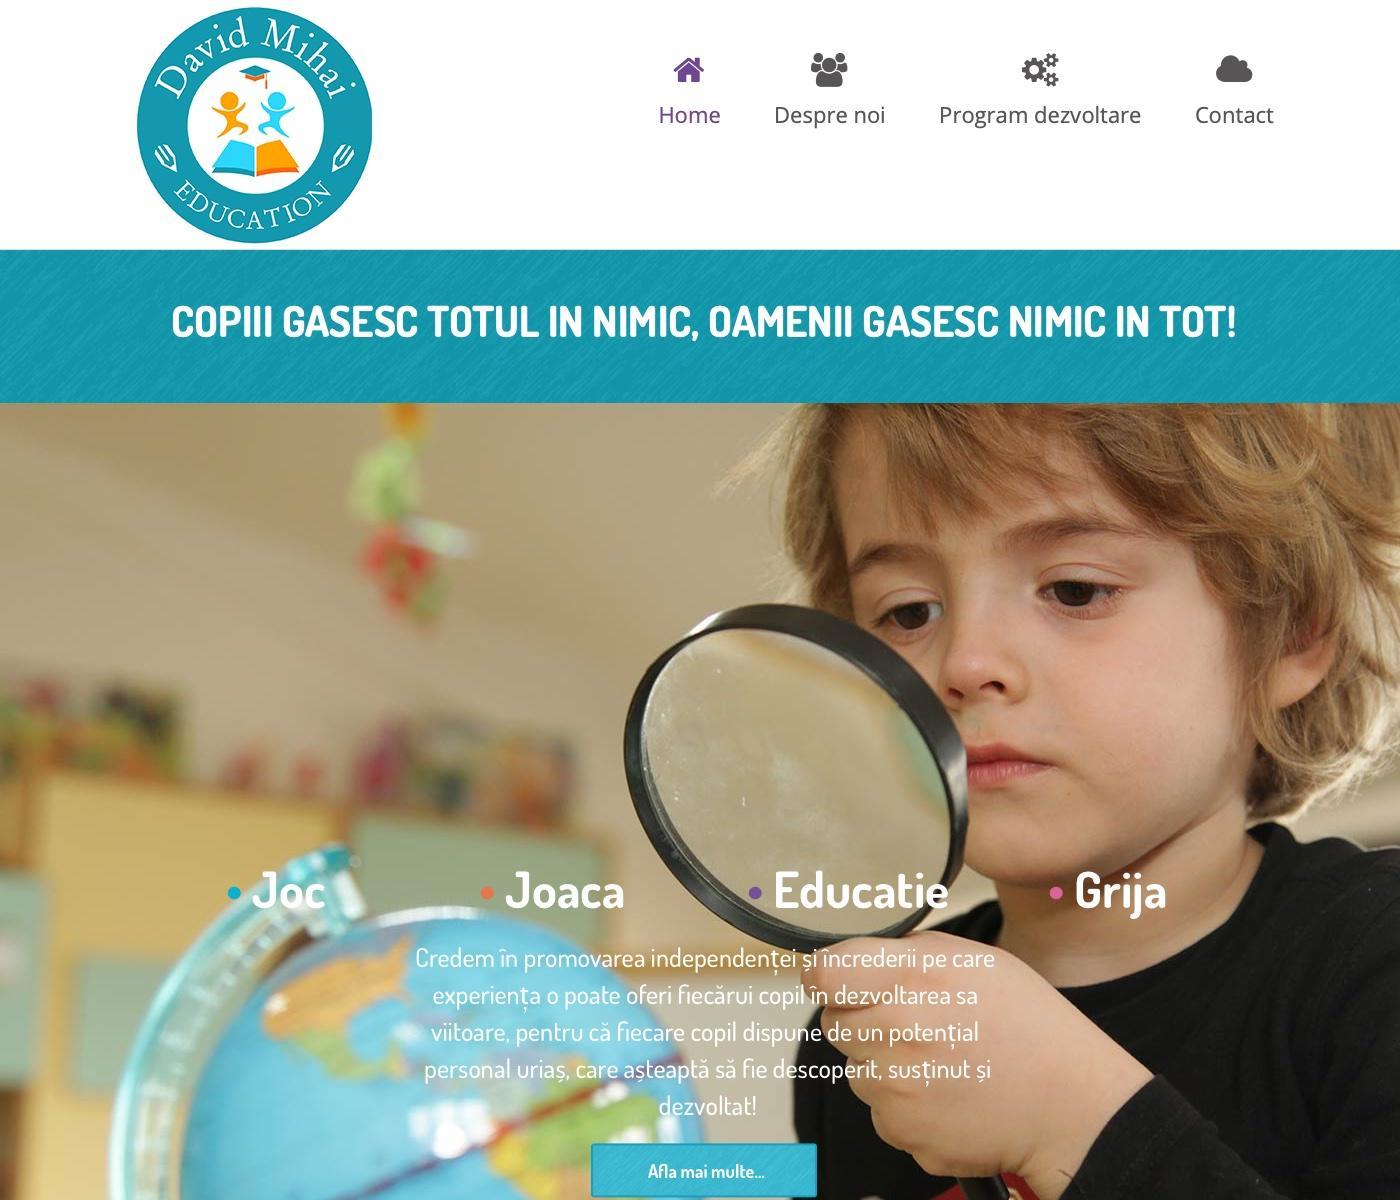 Site de prezentare al gradinitei David Mihai.